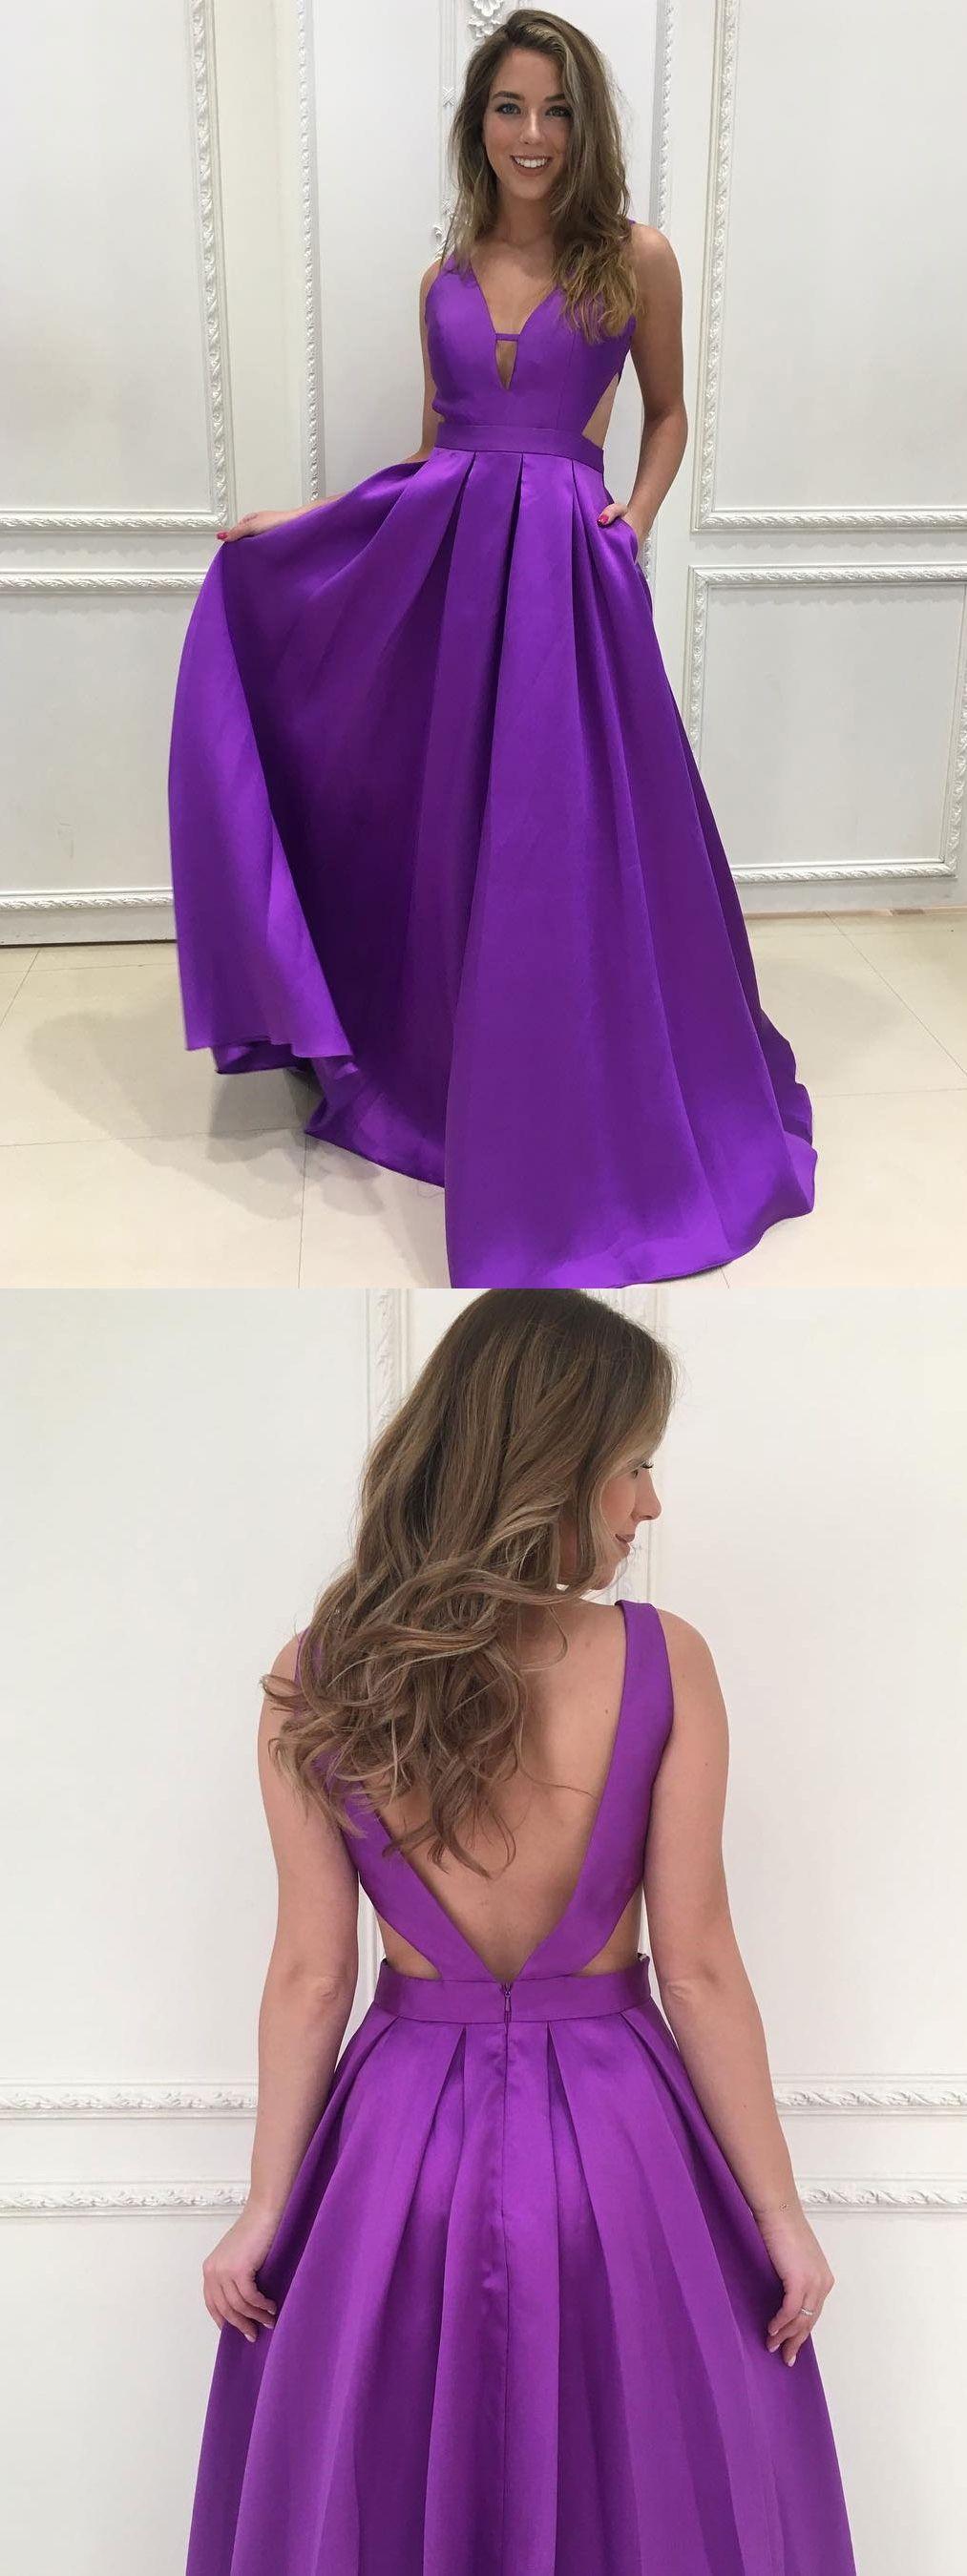 Purple satin simple prom dressescheap prom dressespurple long